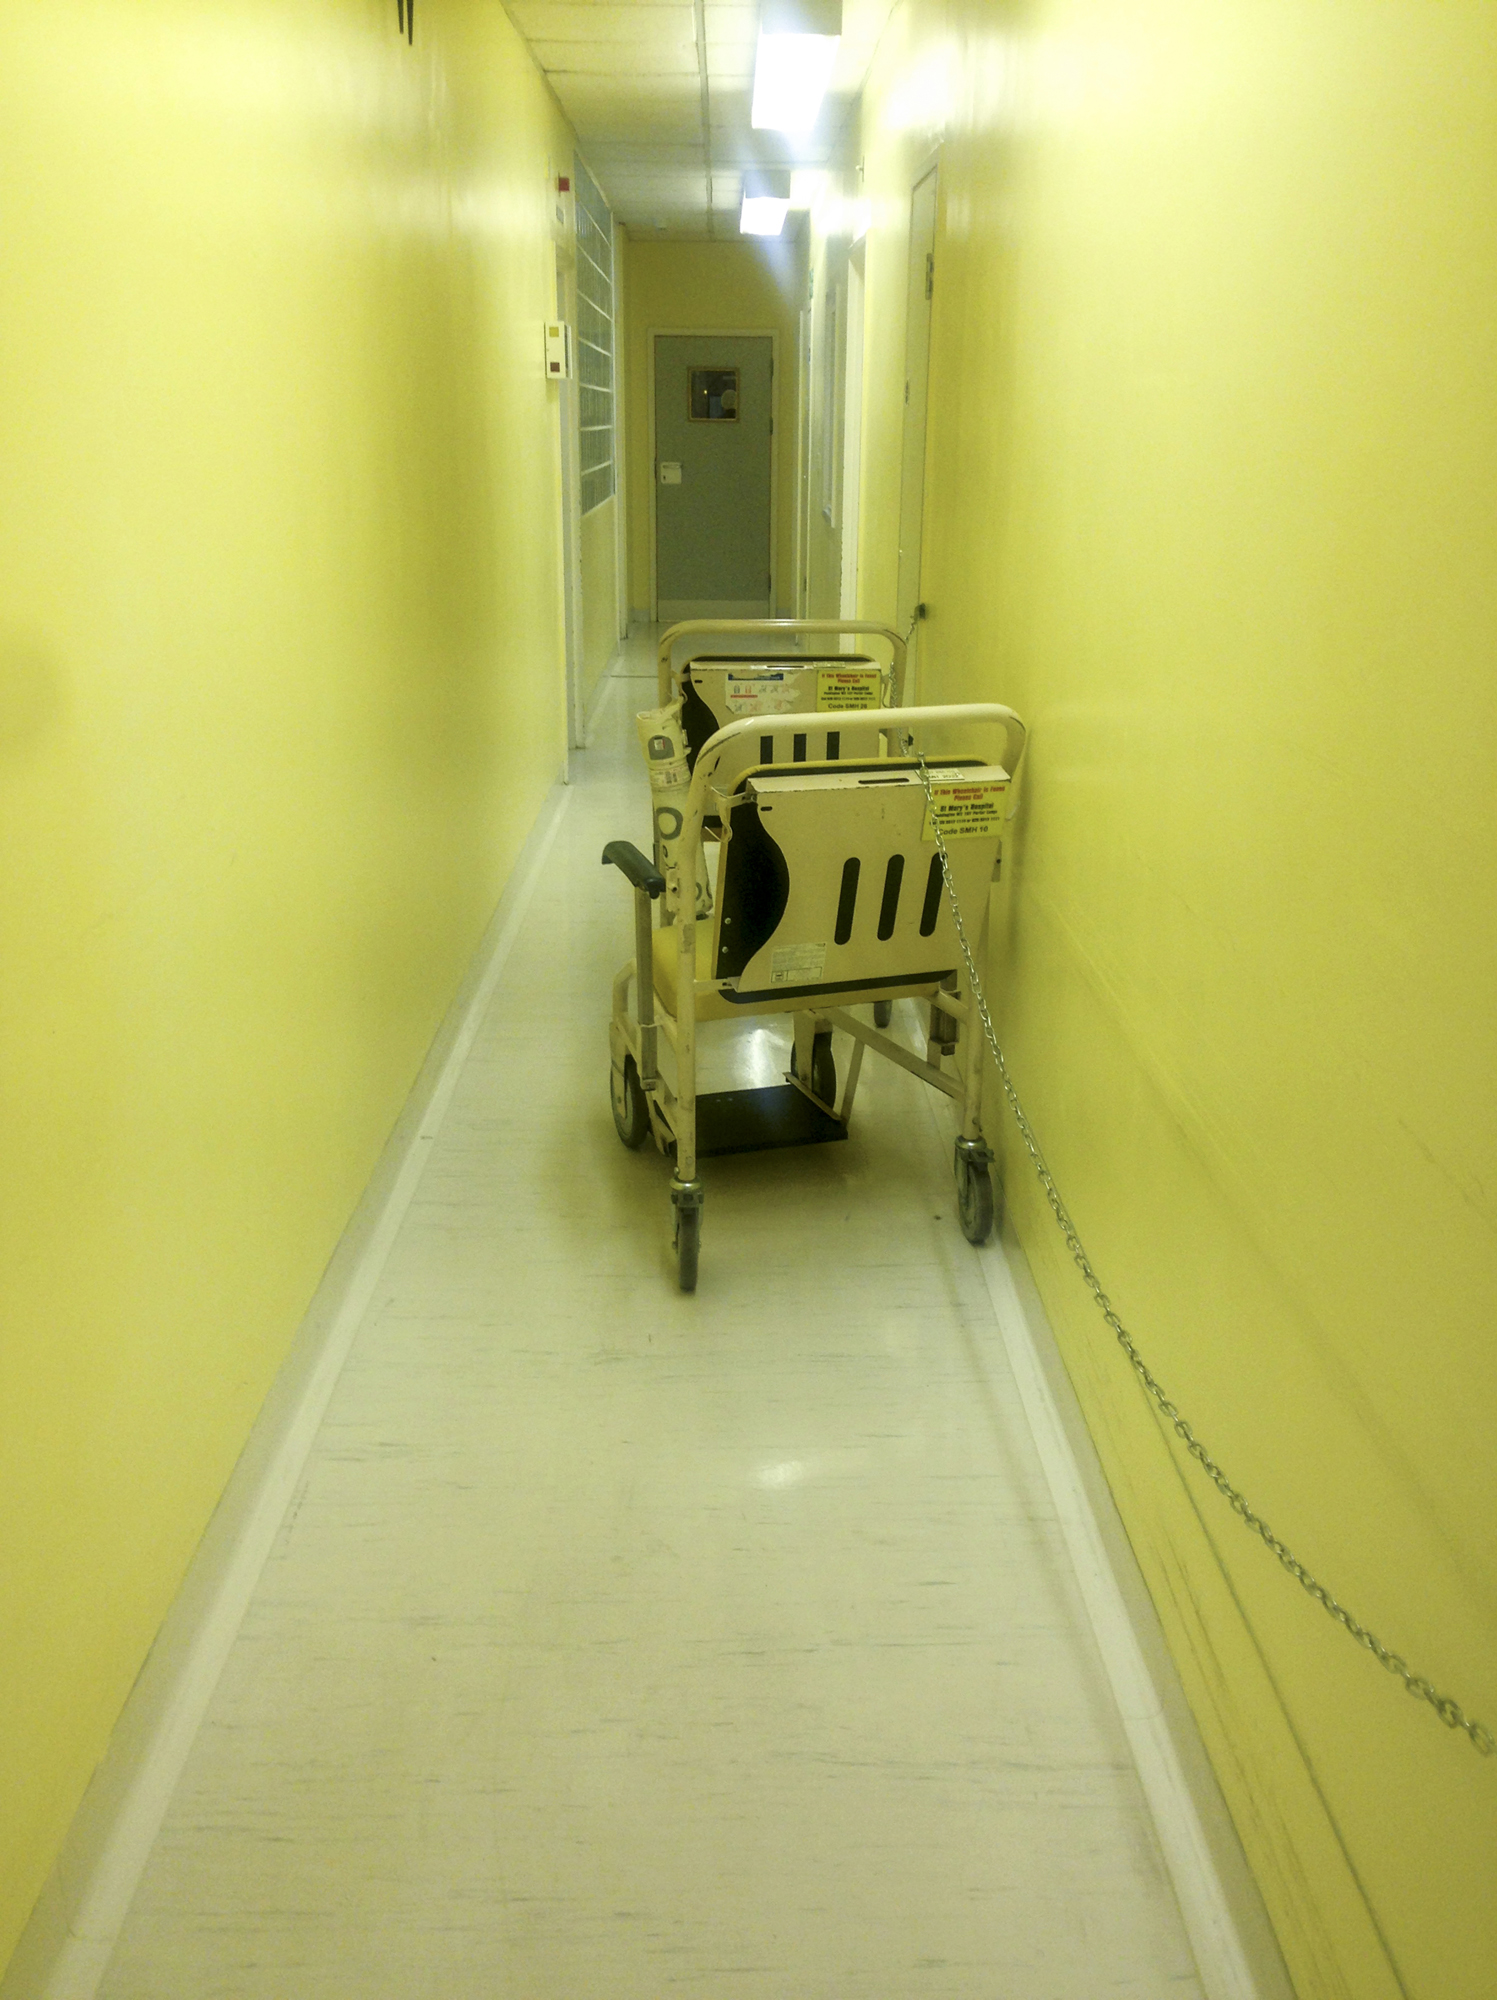 HOSPITAL, London